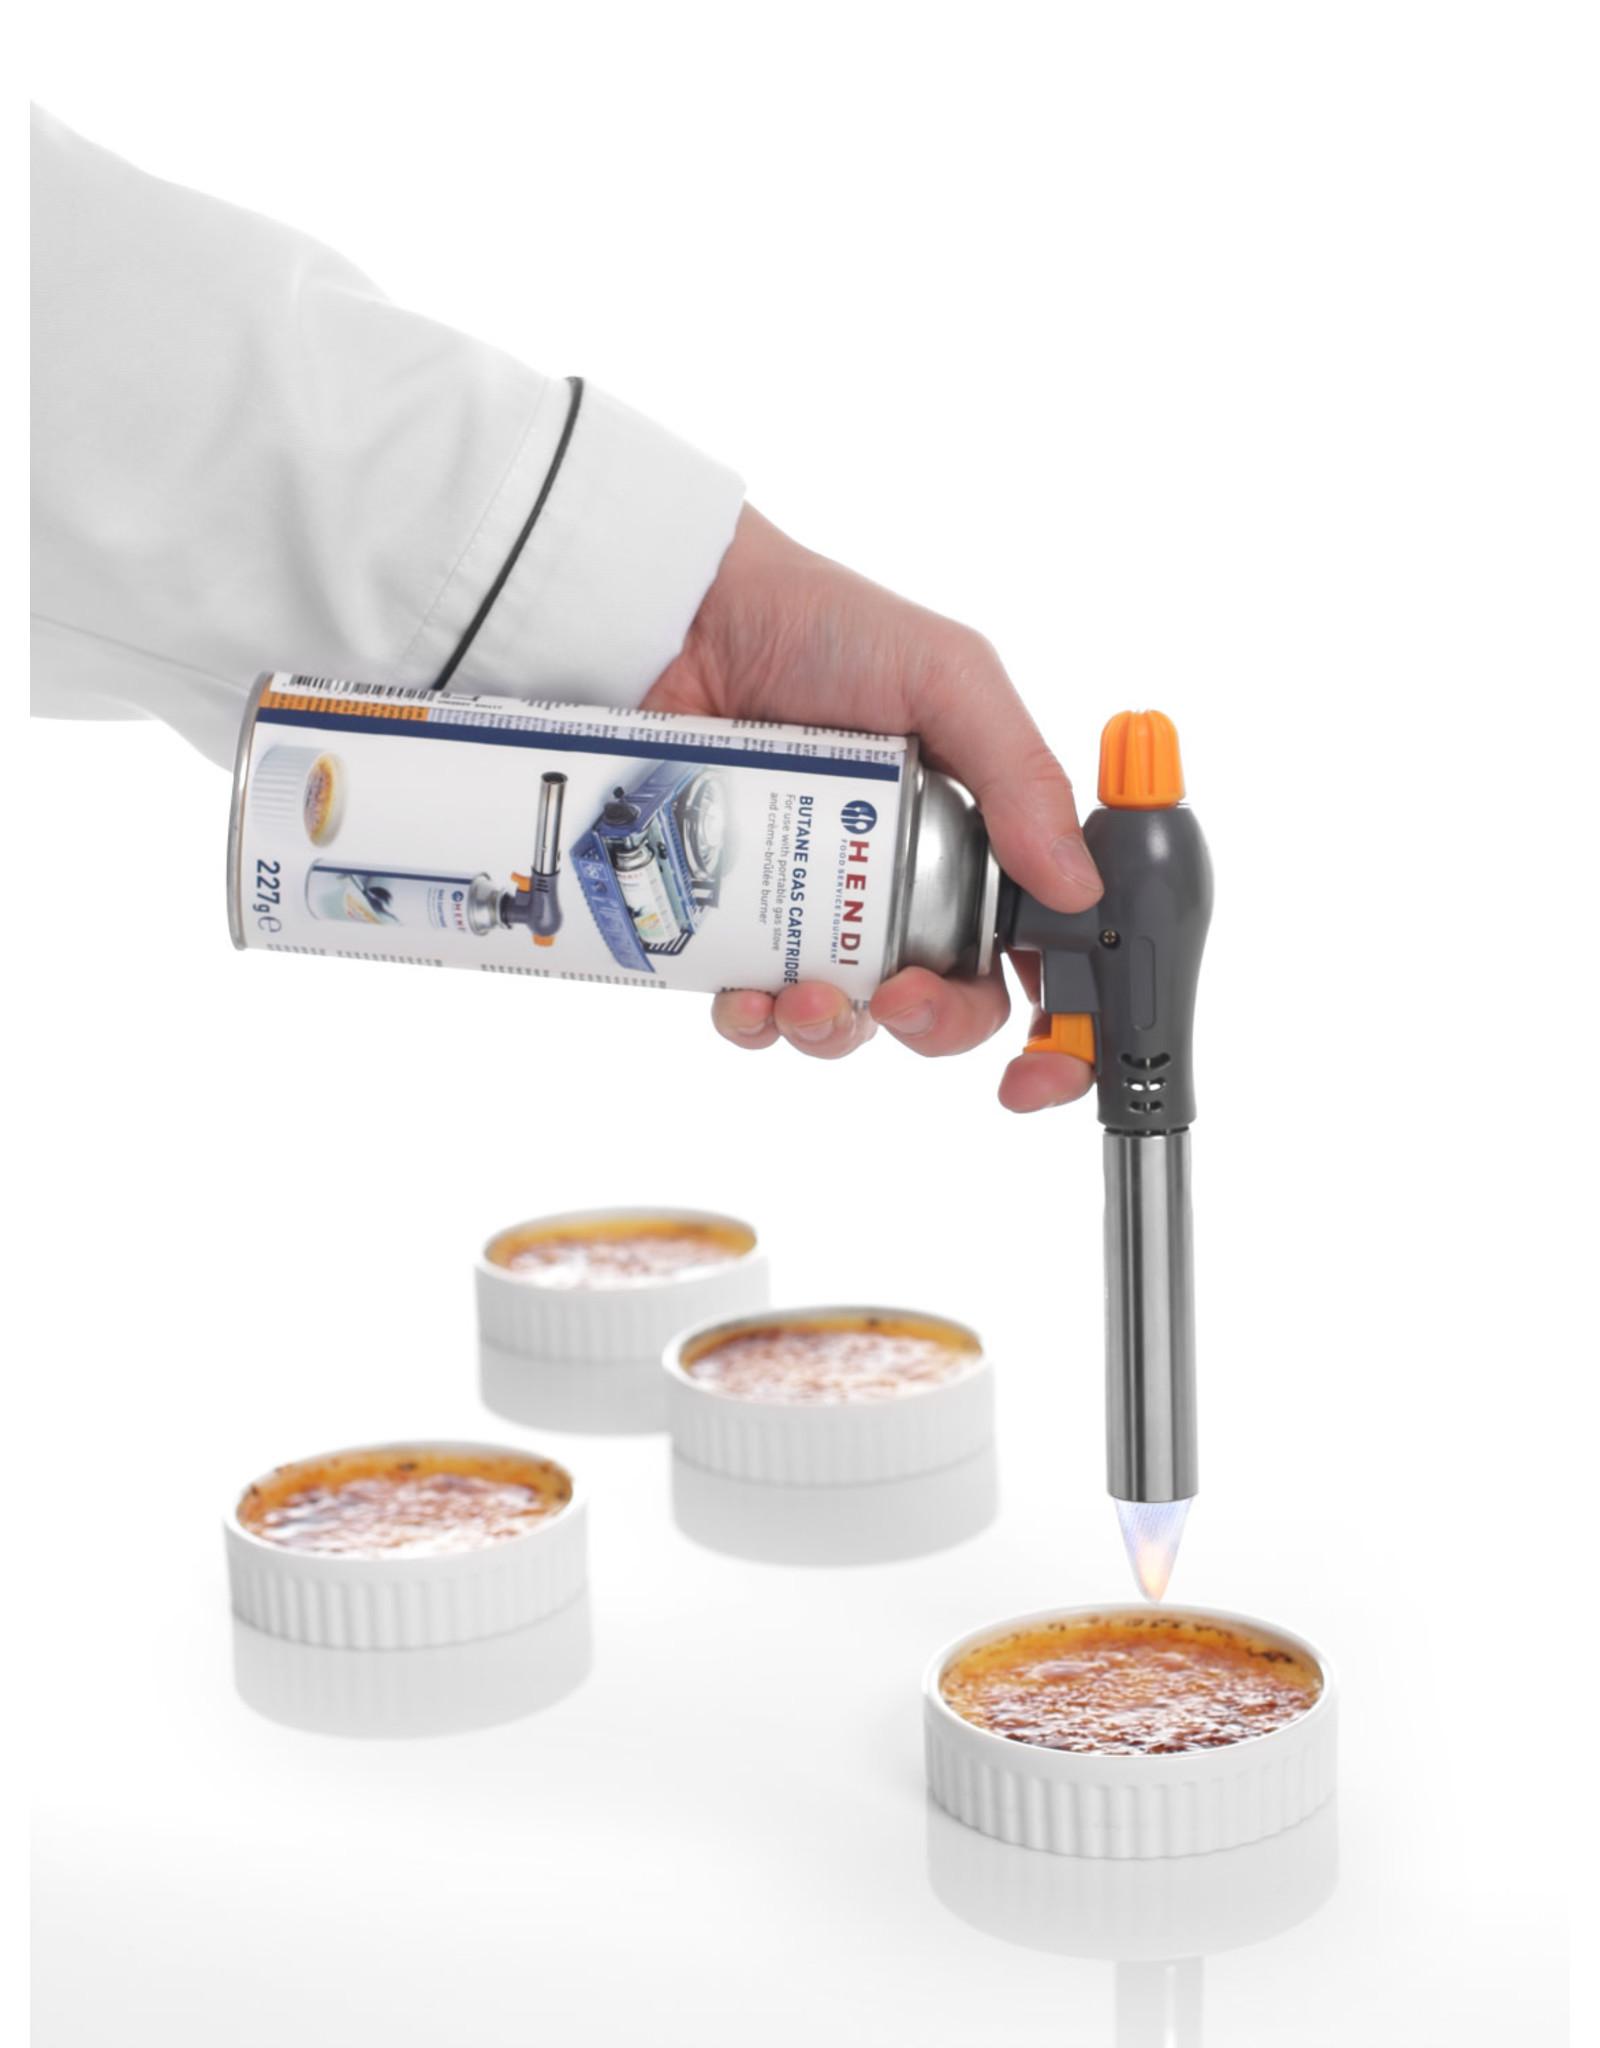 Crème Brûlée brander